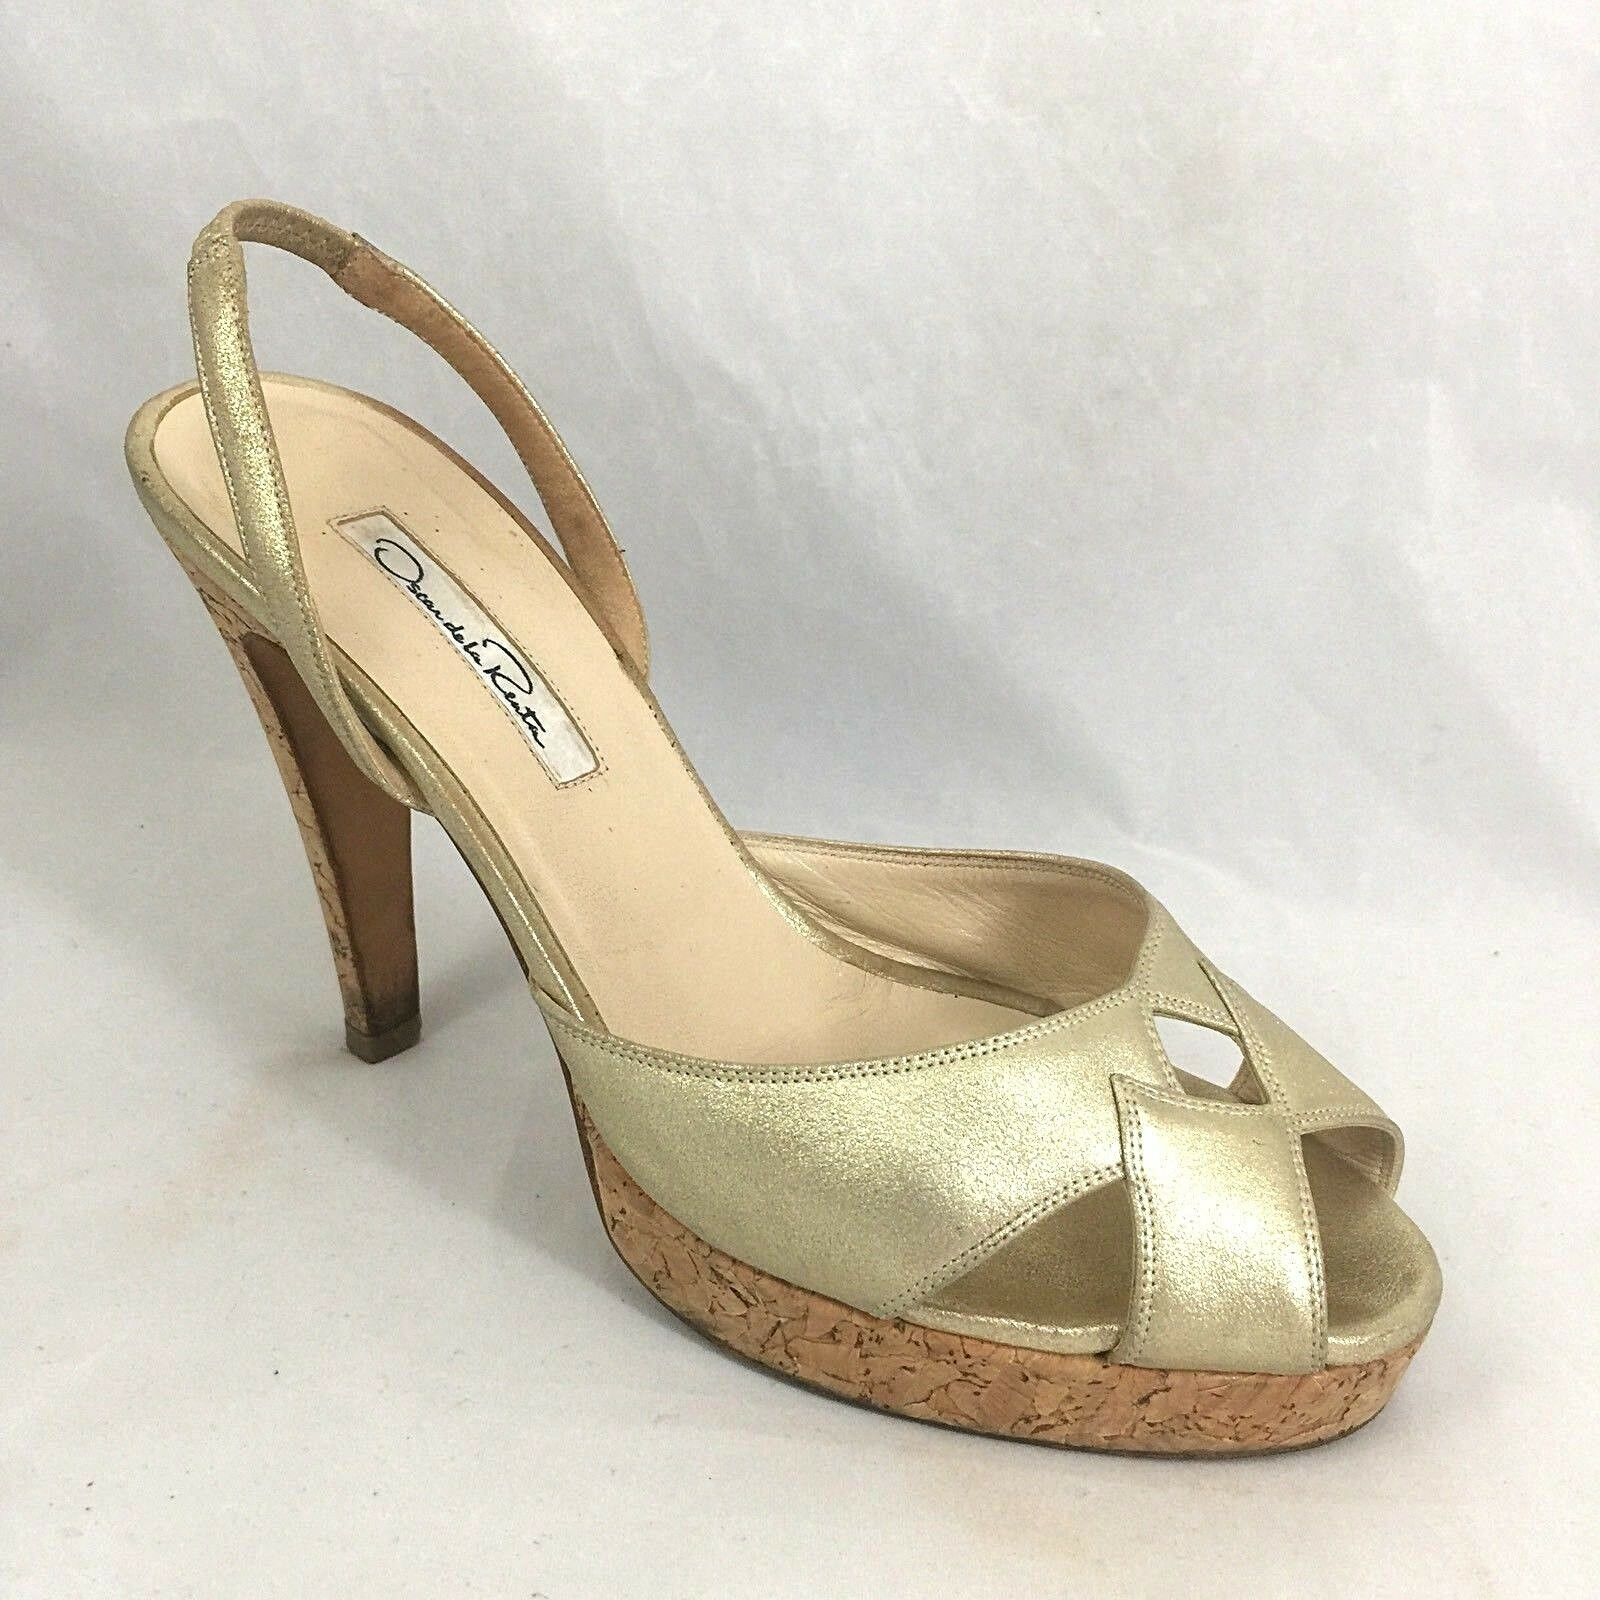 Oscar de la Renta or Metallic Leather Cork Platform Slingback Sandals 37 7